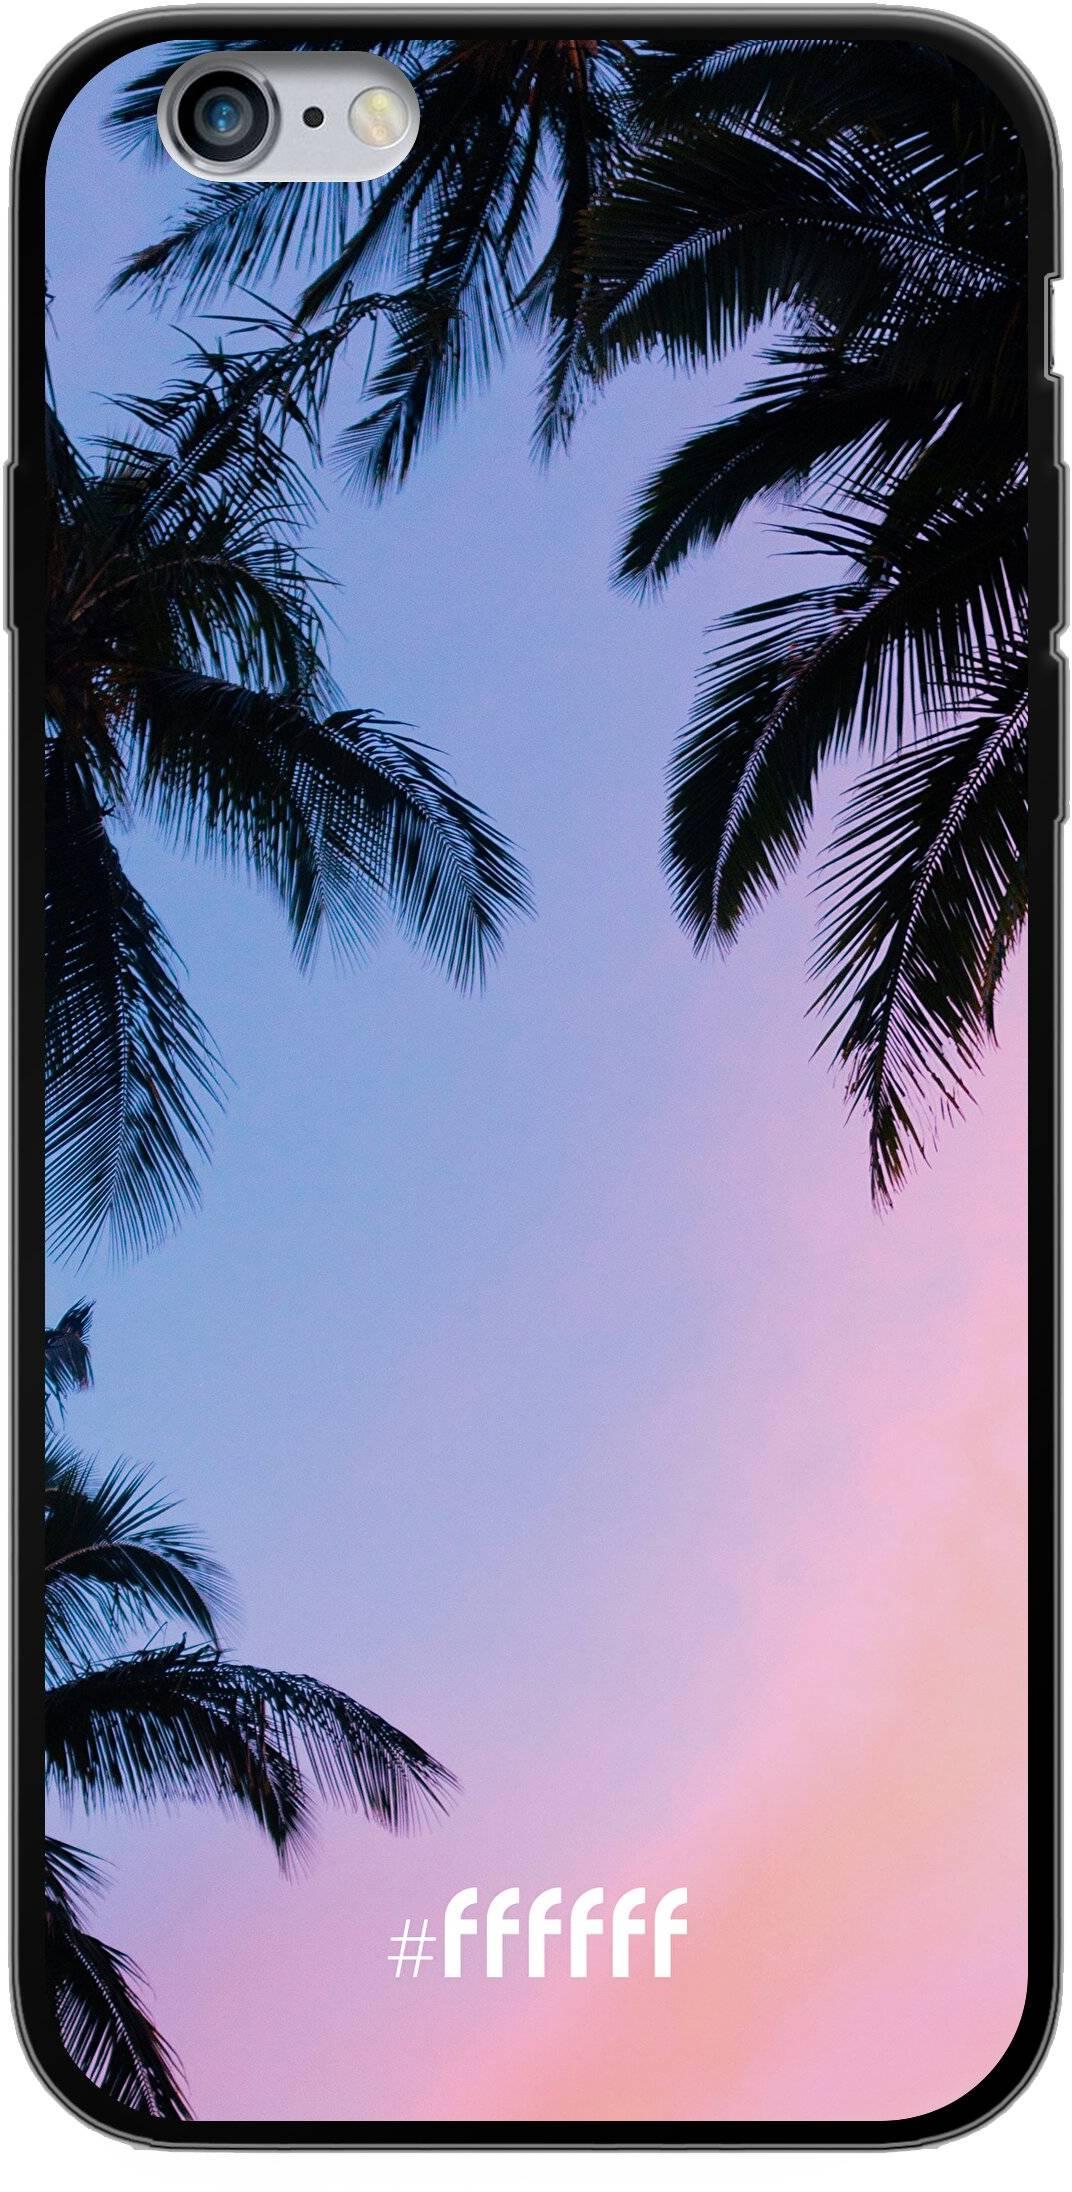 Sunset Palms iPhone 6